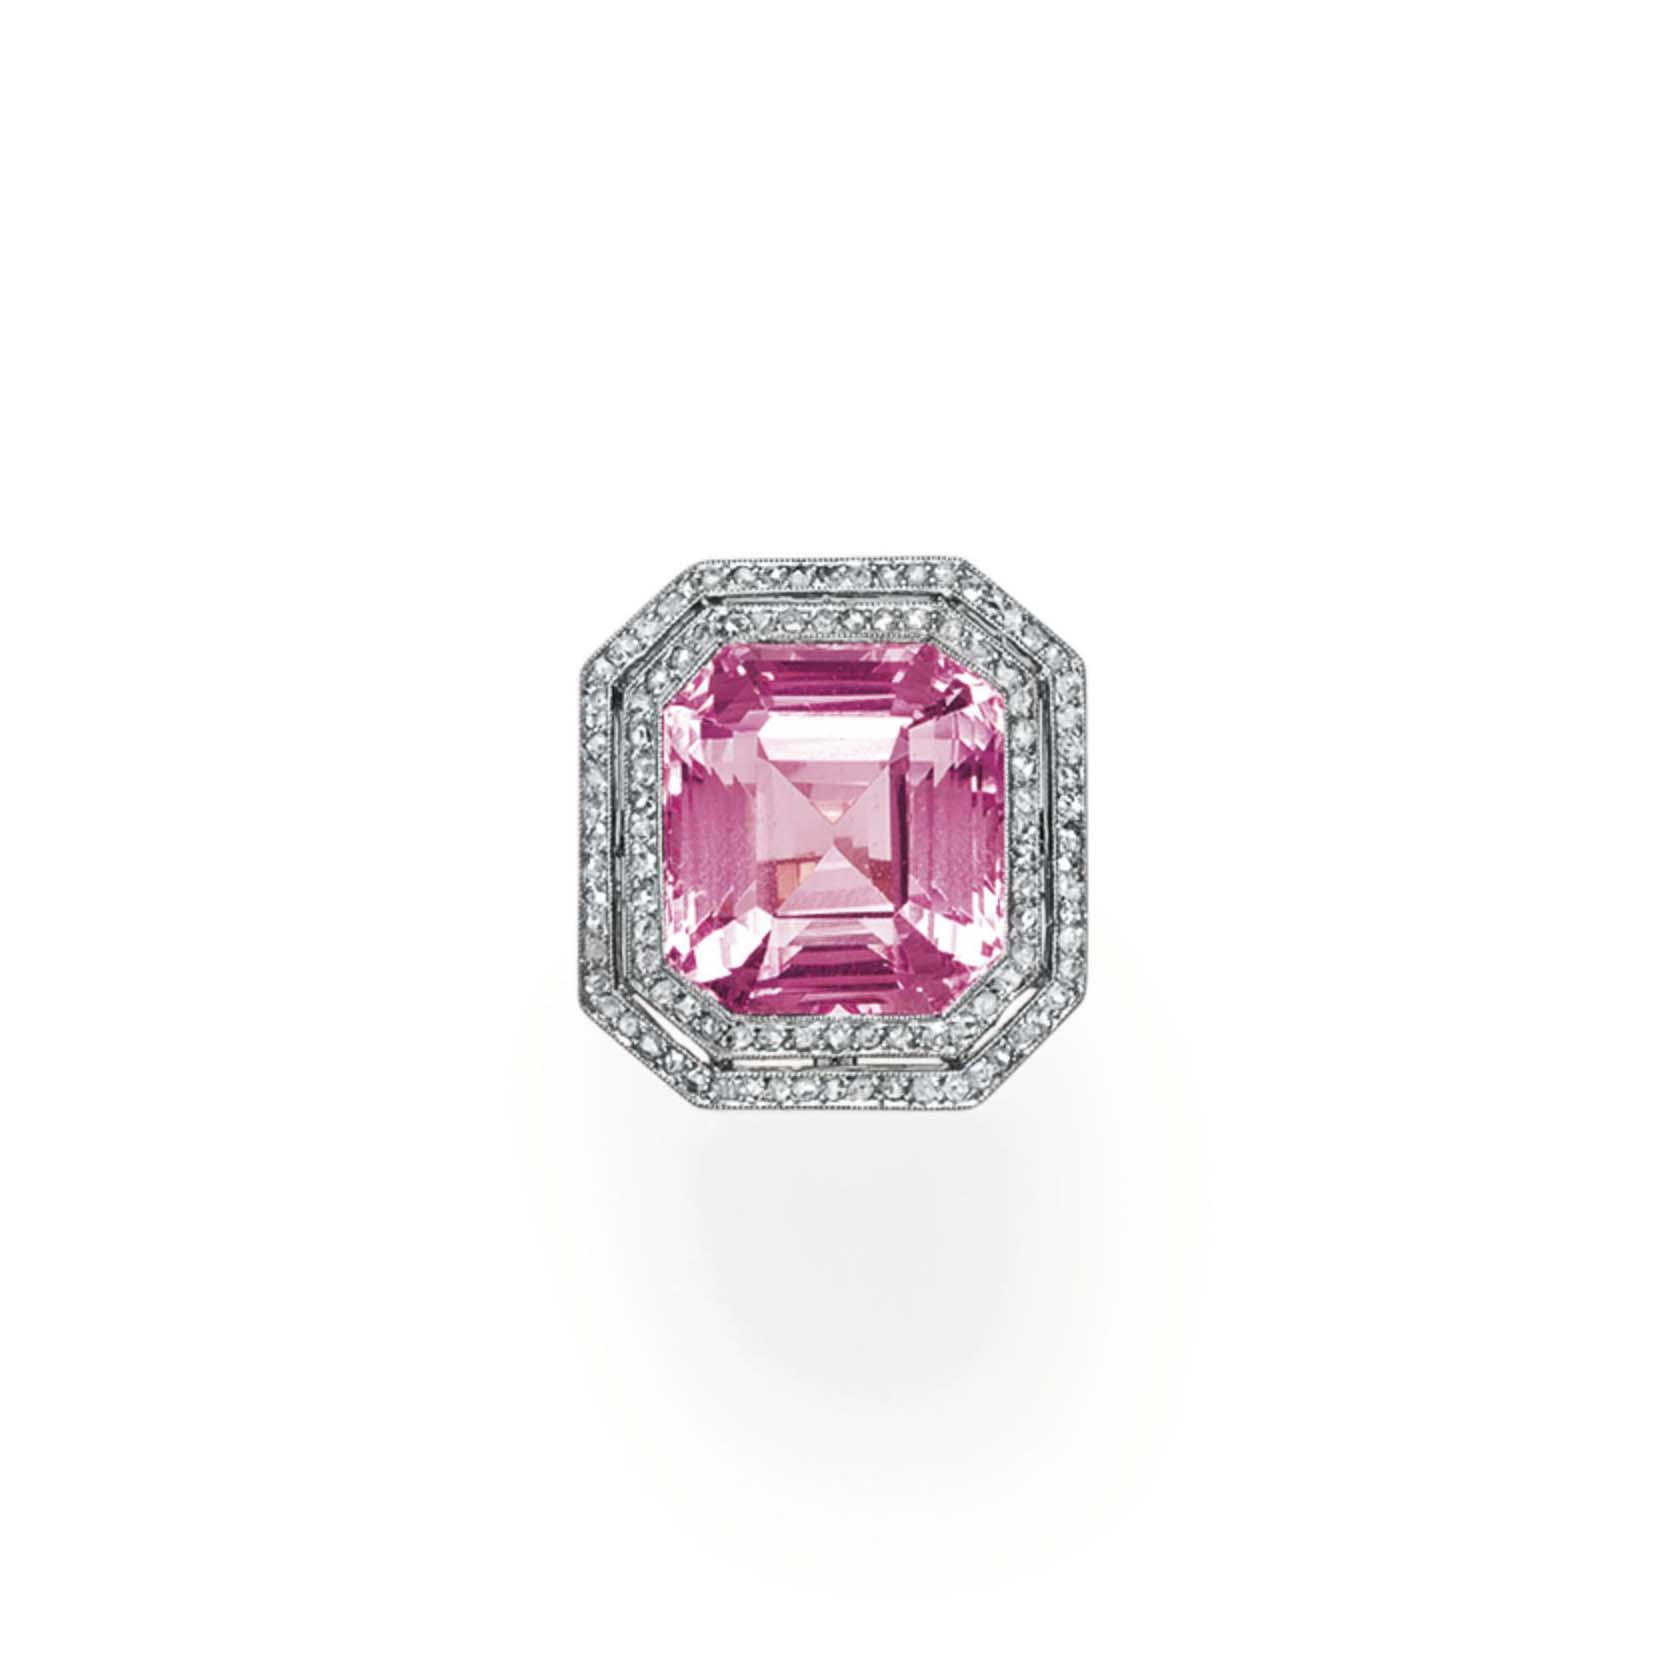 A MORGANITE AND DIAMOND RING